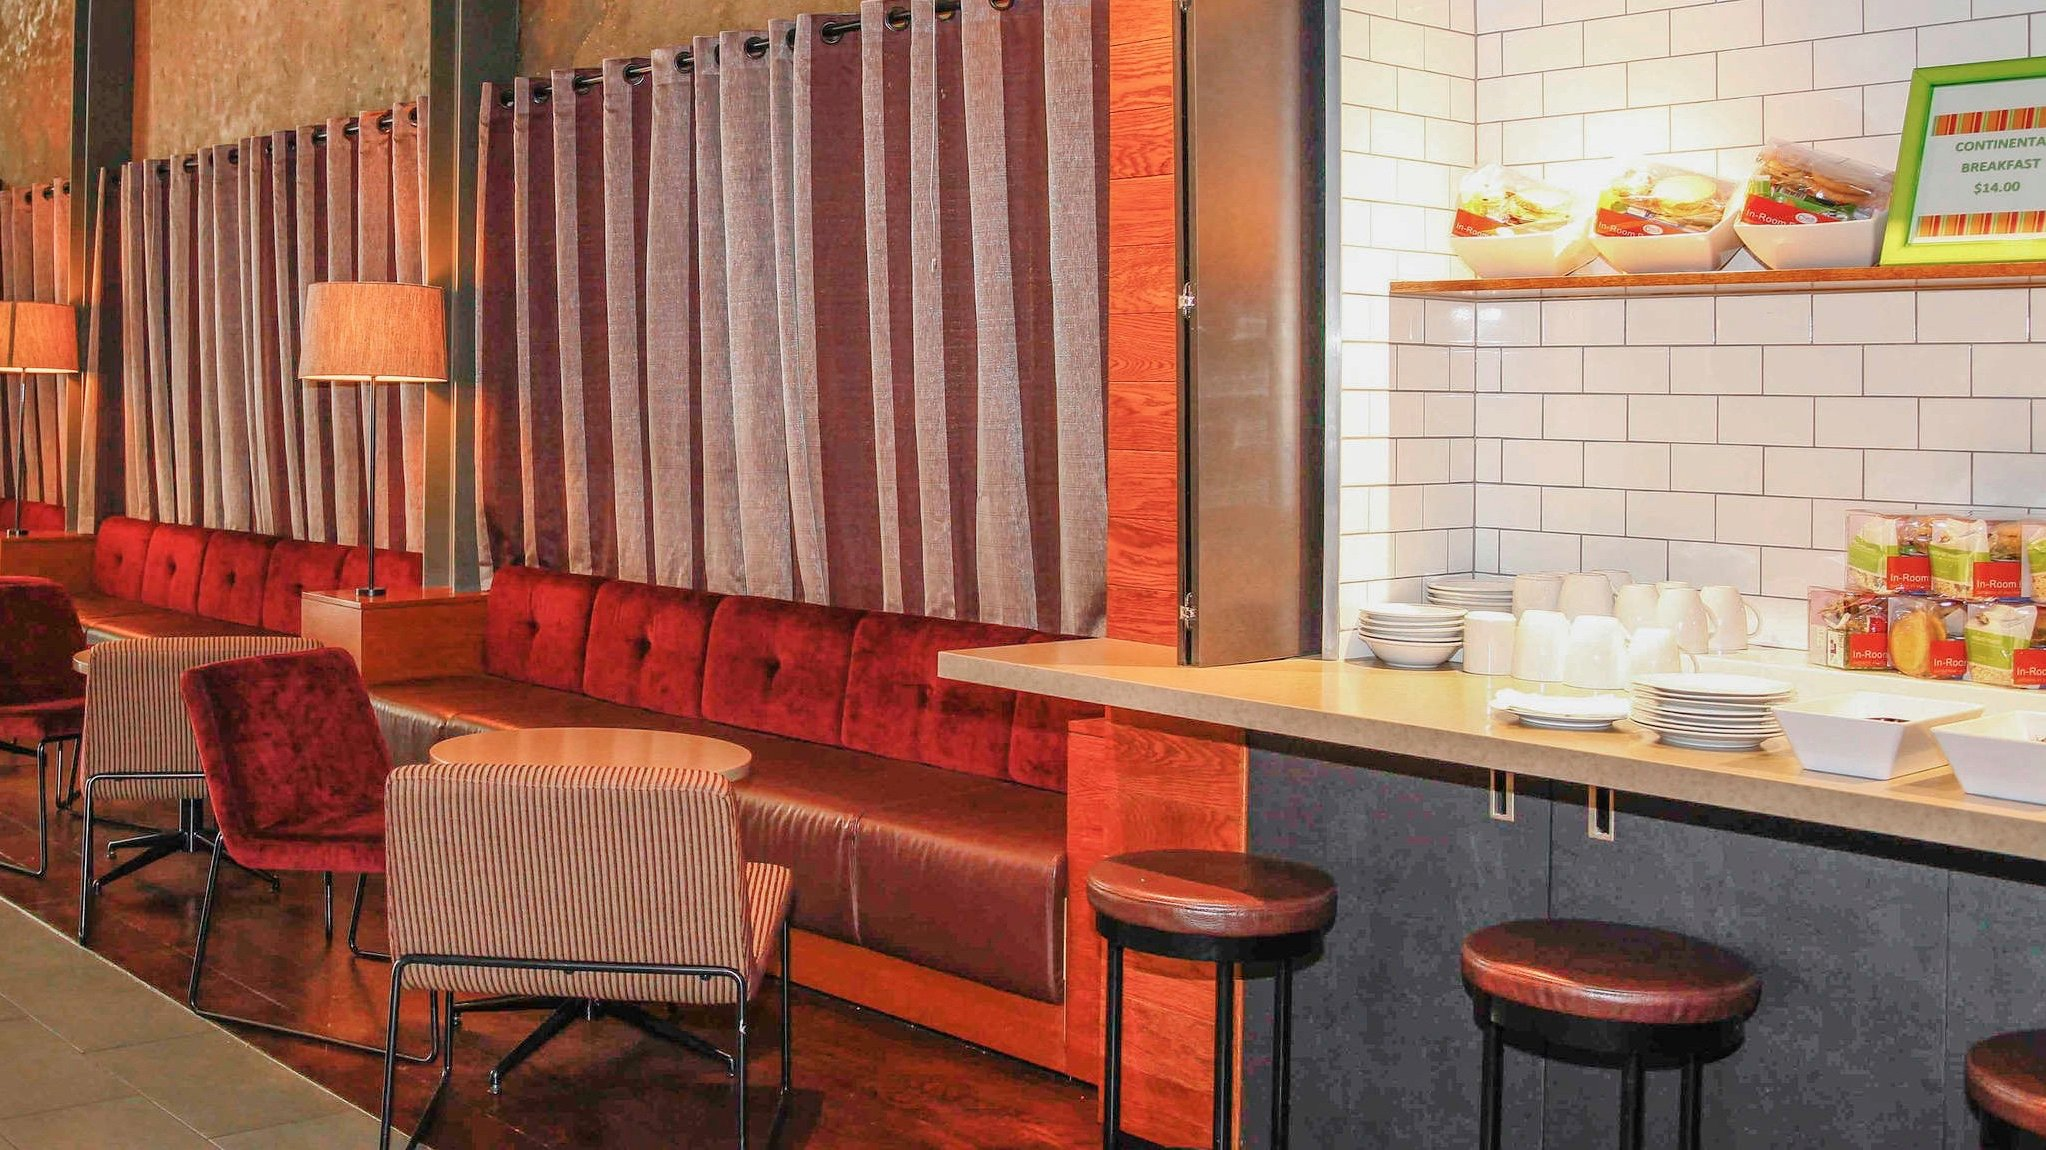 IBIS budget hotel breakfast bar